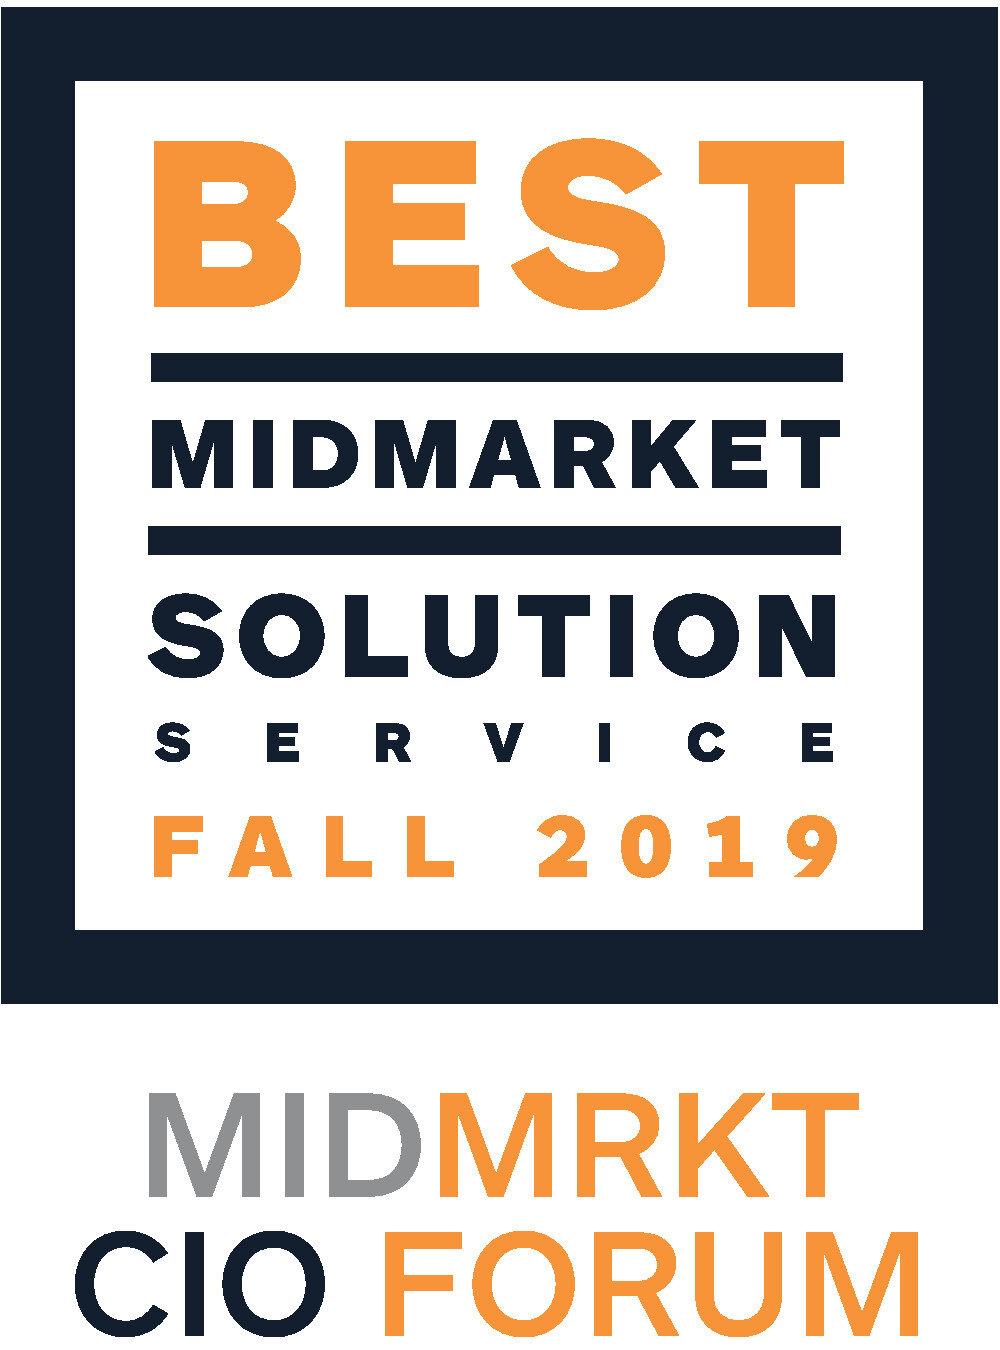 MCIOF Solution - Service 2019 Fall.jpg